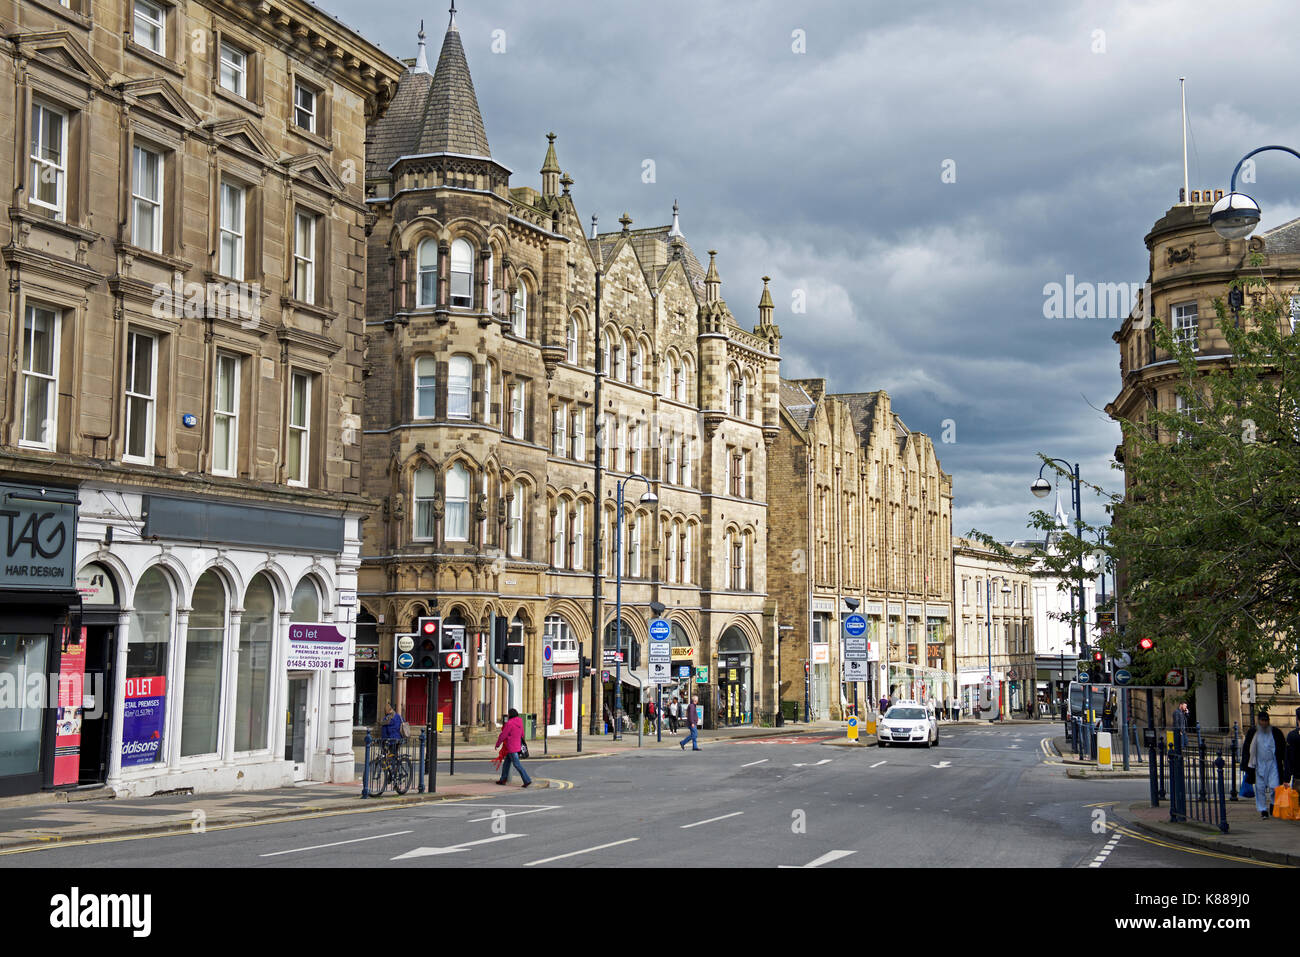 Westgate, Huddersfield, Kirklees, West Yorkshire, England UK - Stock Image